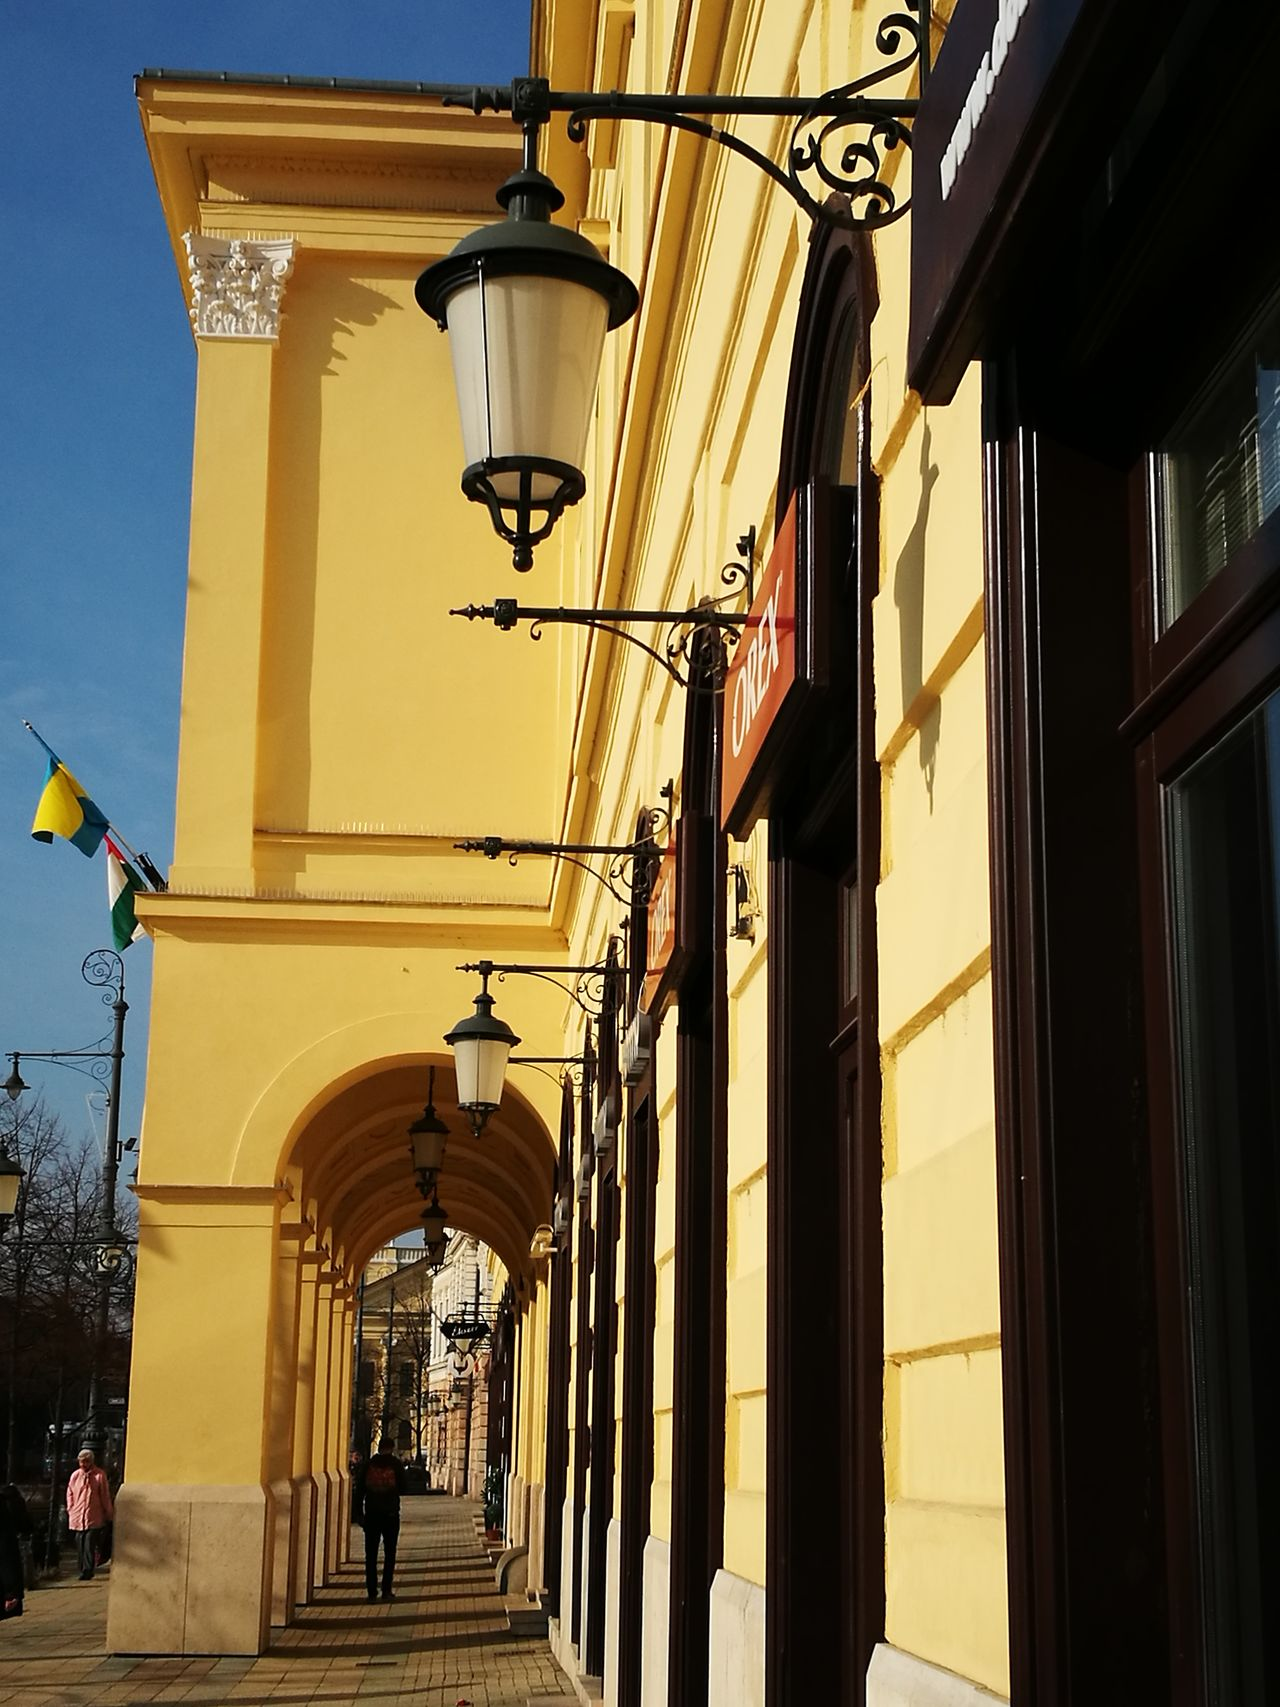 Debrecen Mayor Office Old Buildings Yellow Lamp Main Street Main Square Hometown HuaweiP9